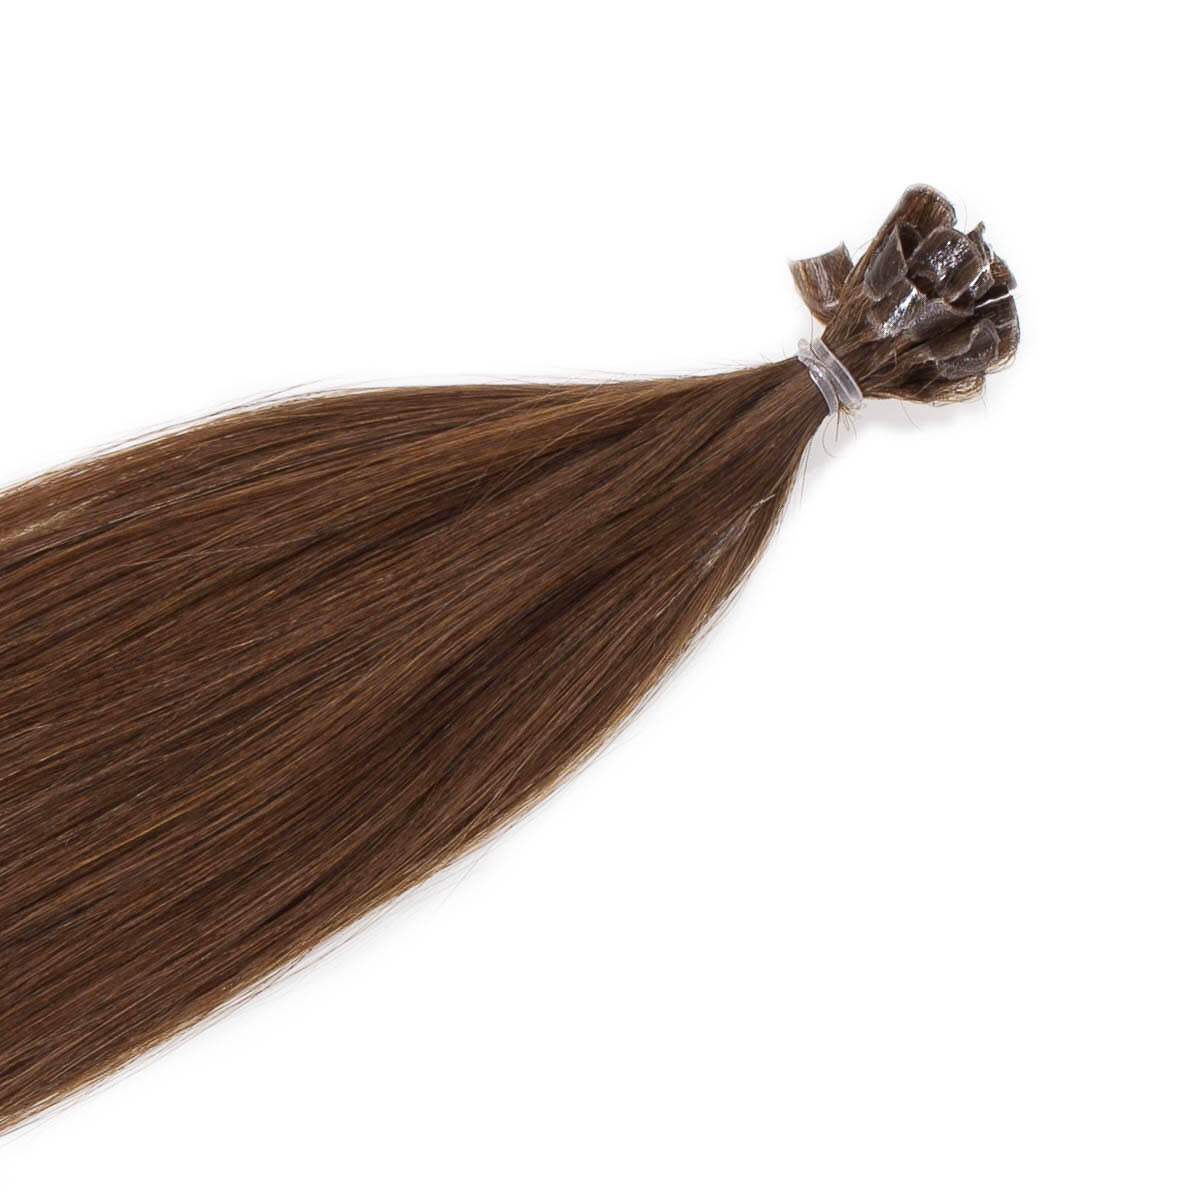 Bondings Premium Glatt 5.0 Brown 50 cm